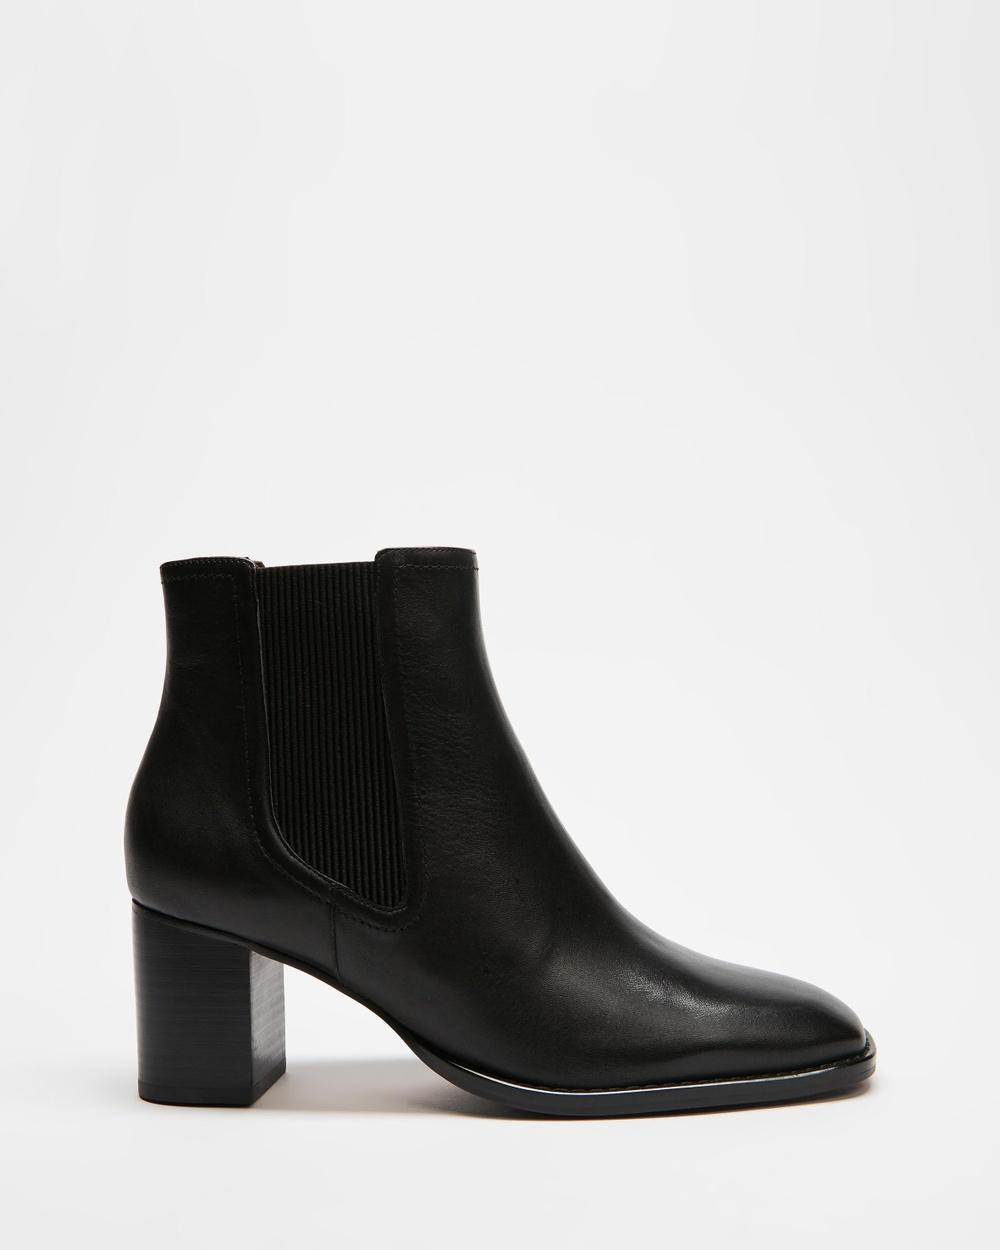 Tony Bianco Wager Boots Black Como Australia